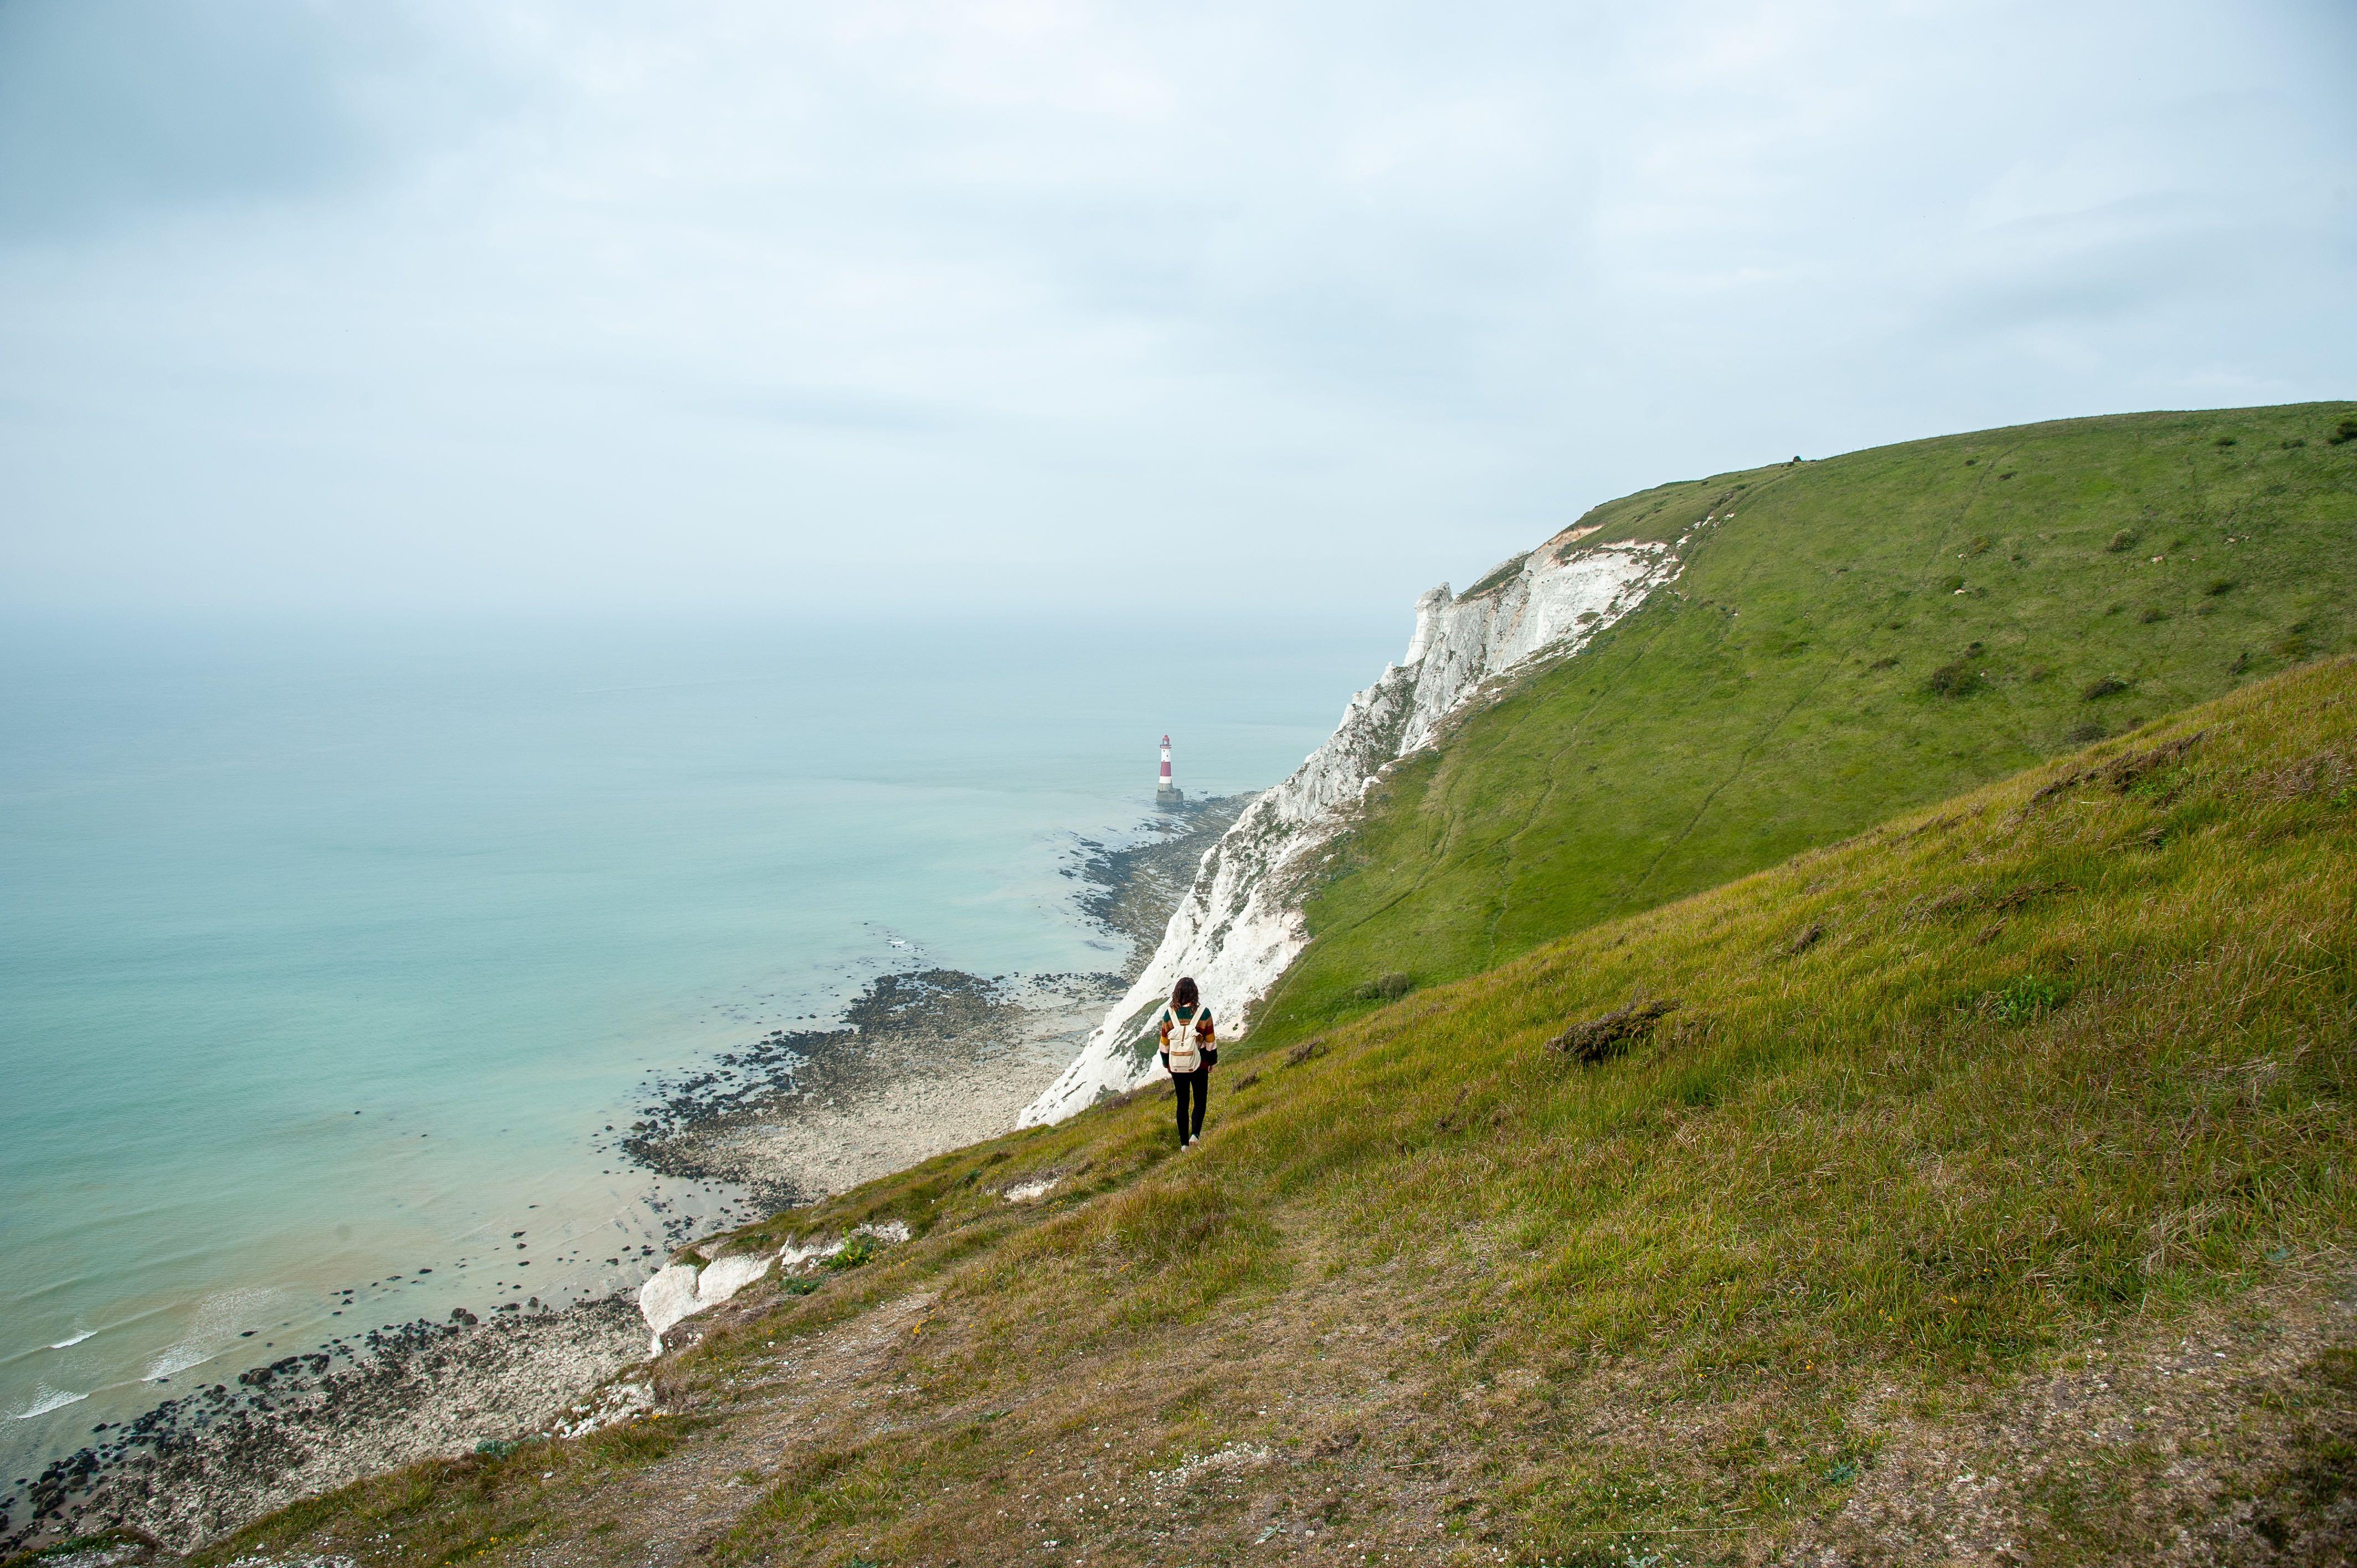 Visiter le phare de Beachy Head, Eastbourne, Angleterre